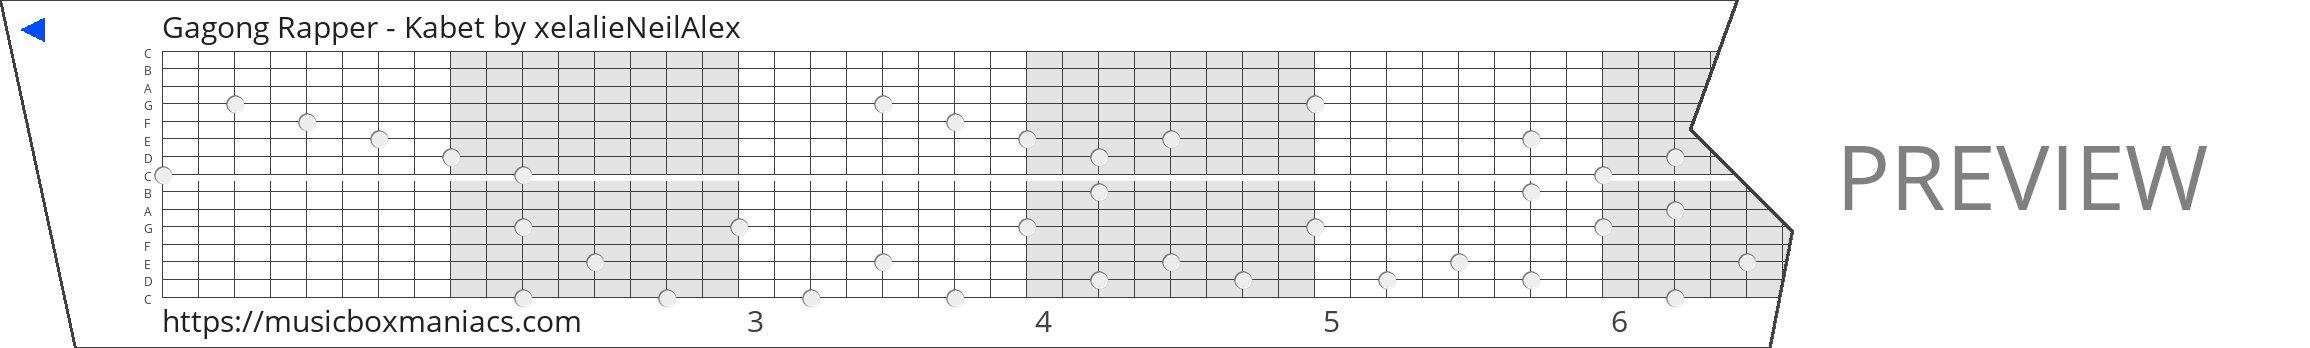 Gagong Rapper - Kabet 15 note music box paper strip